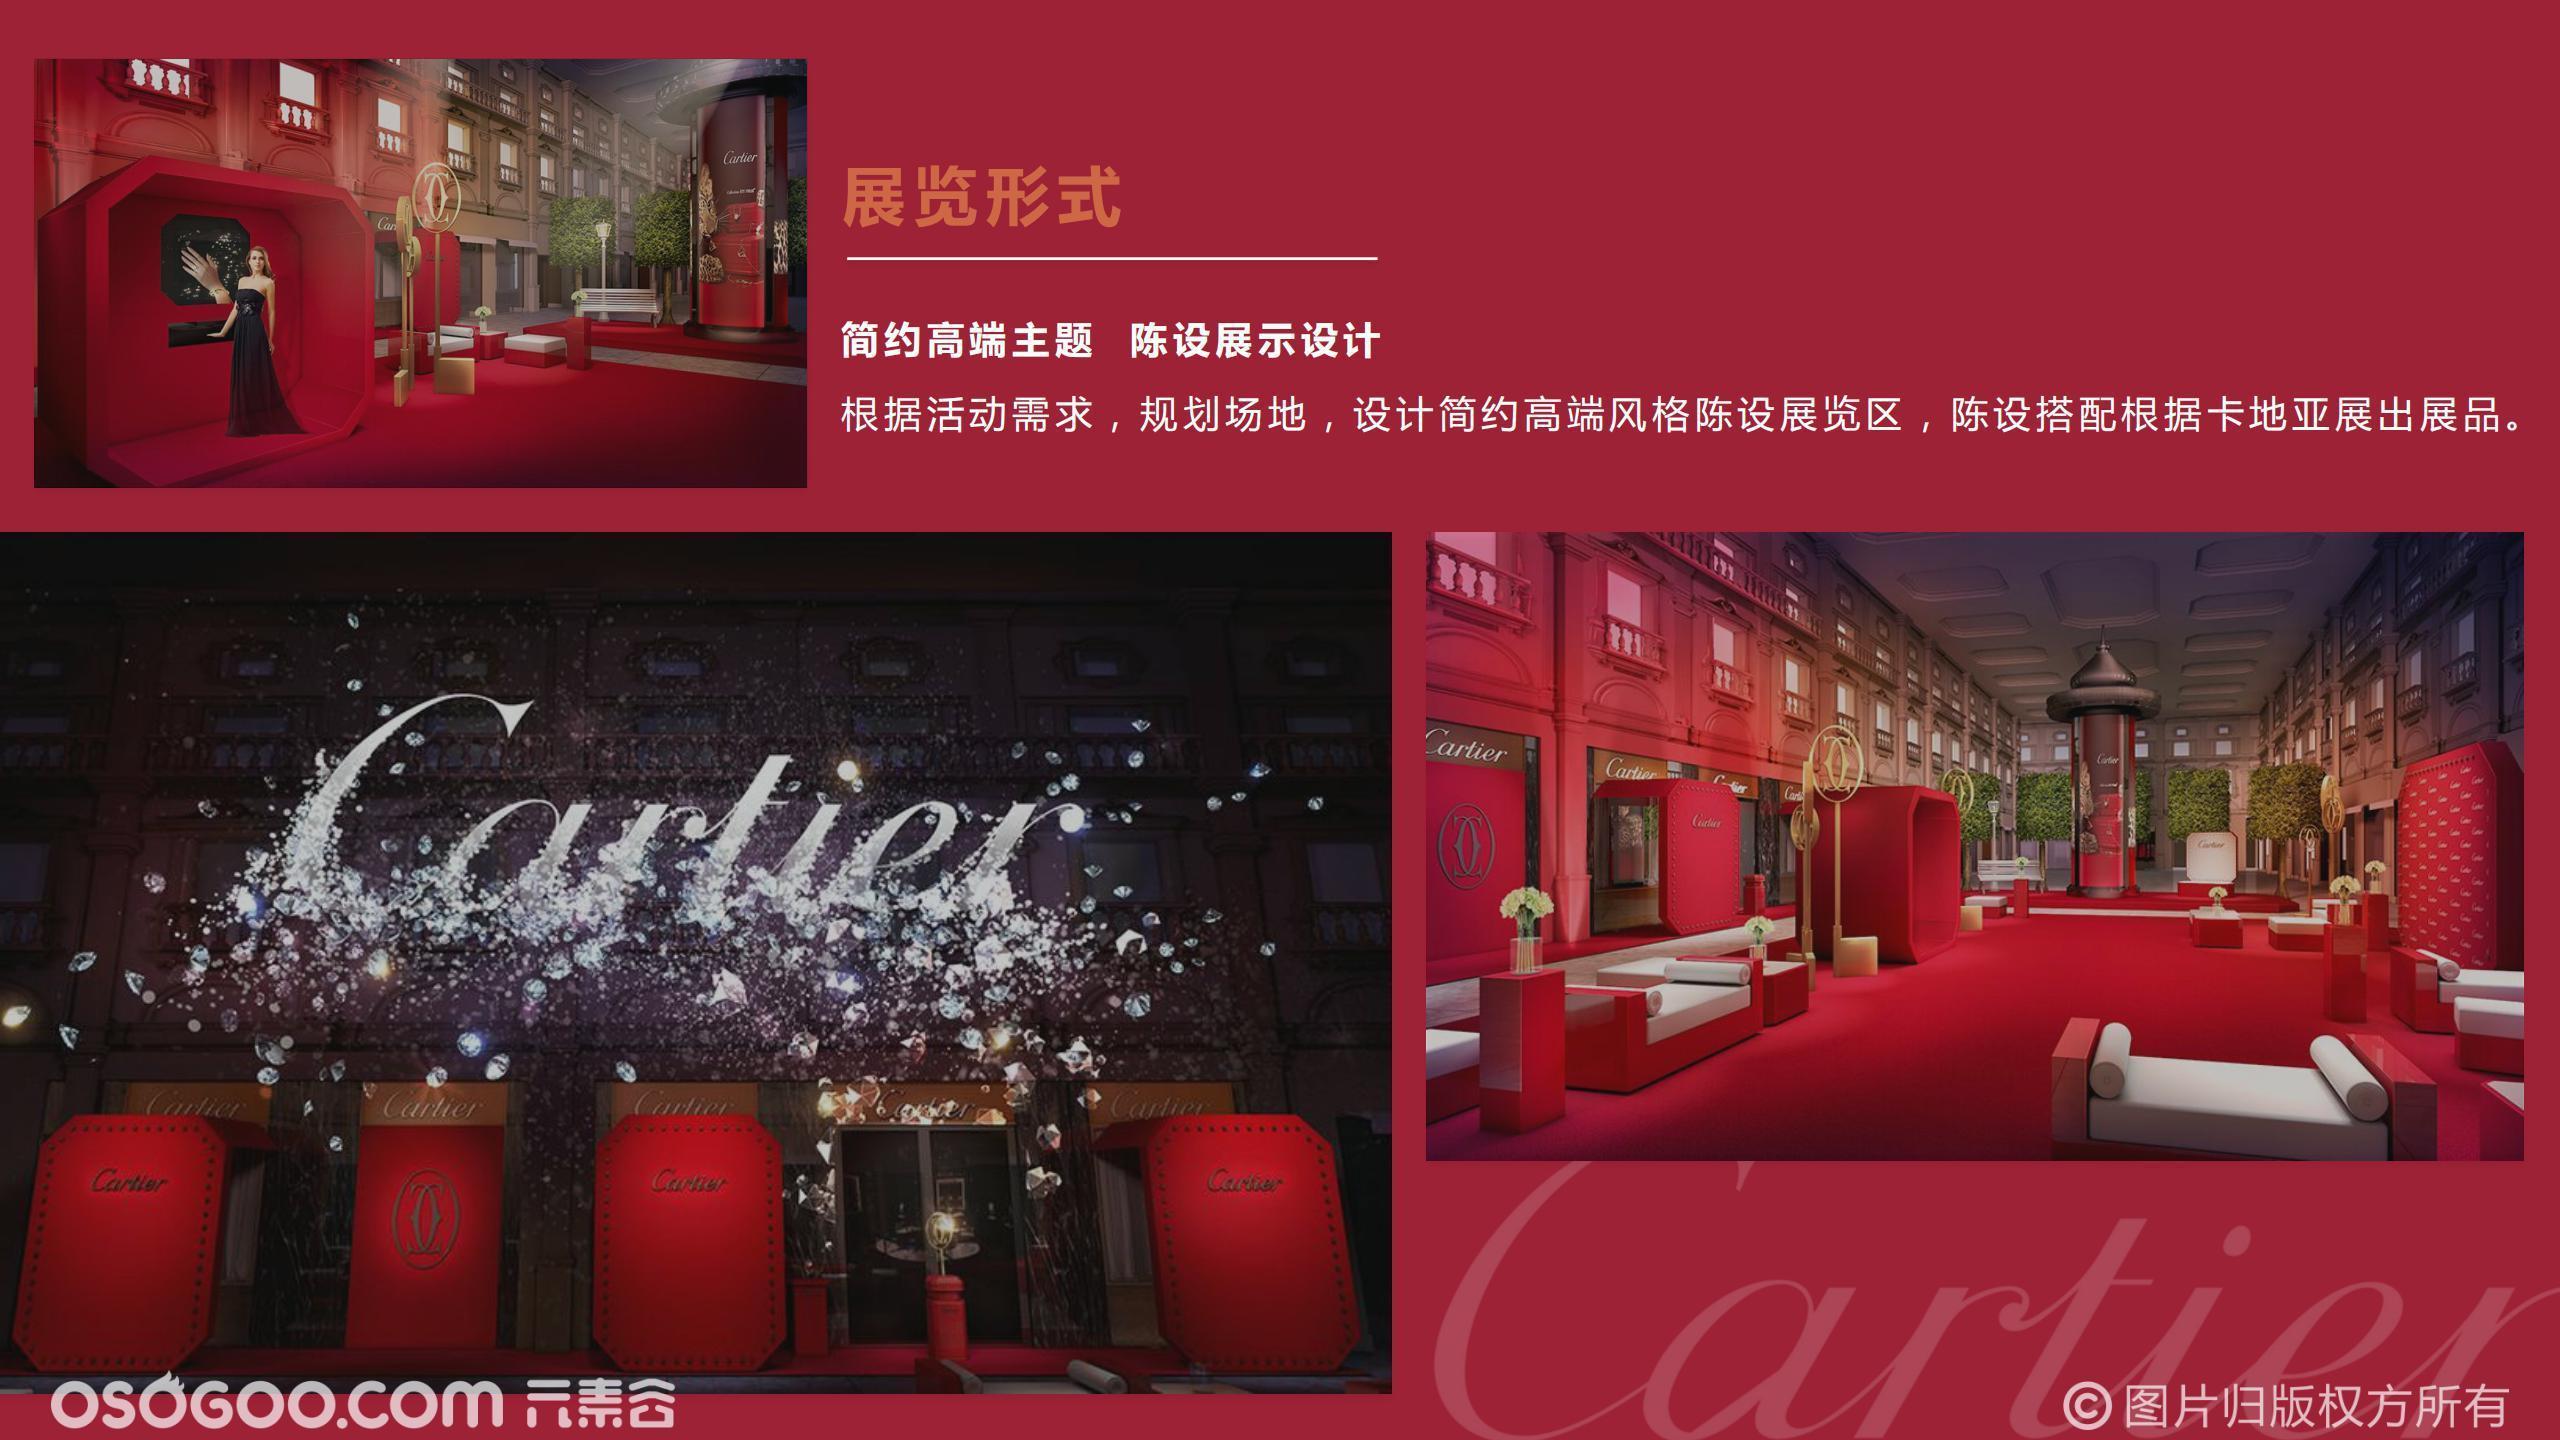 Cartier奢侈品  卡地亚珠宝展览展示